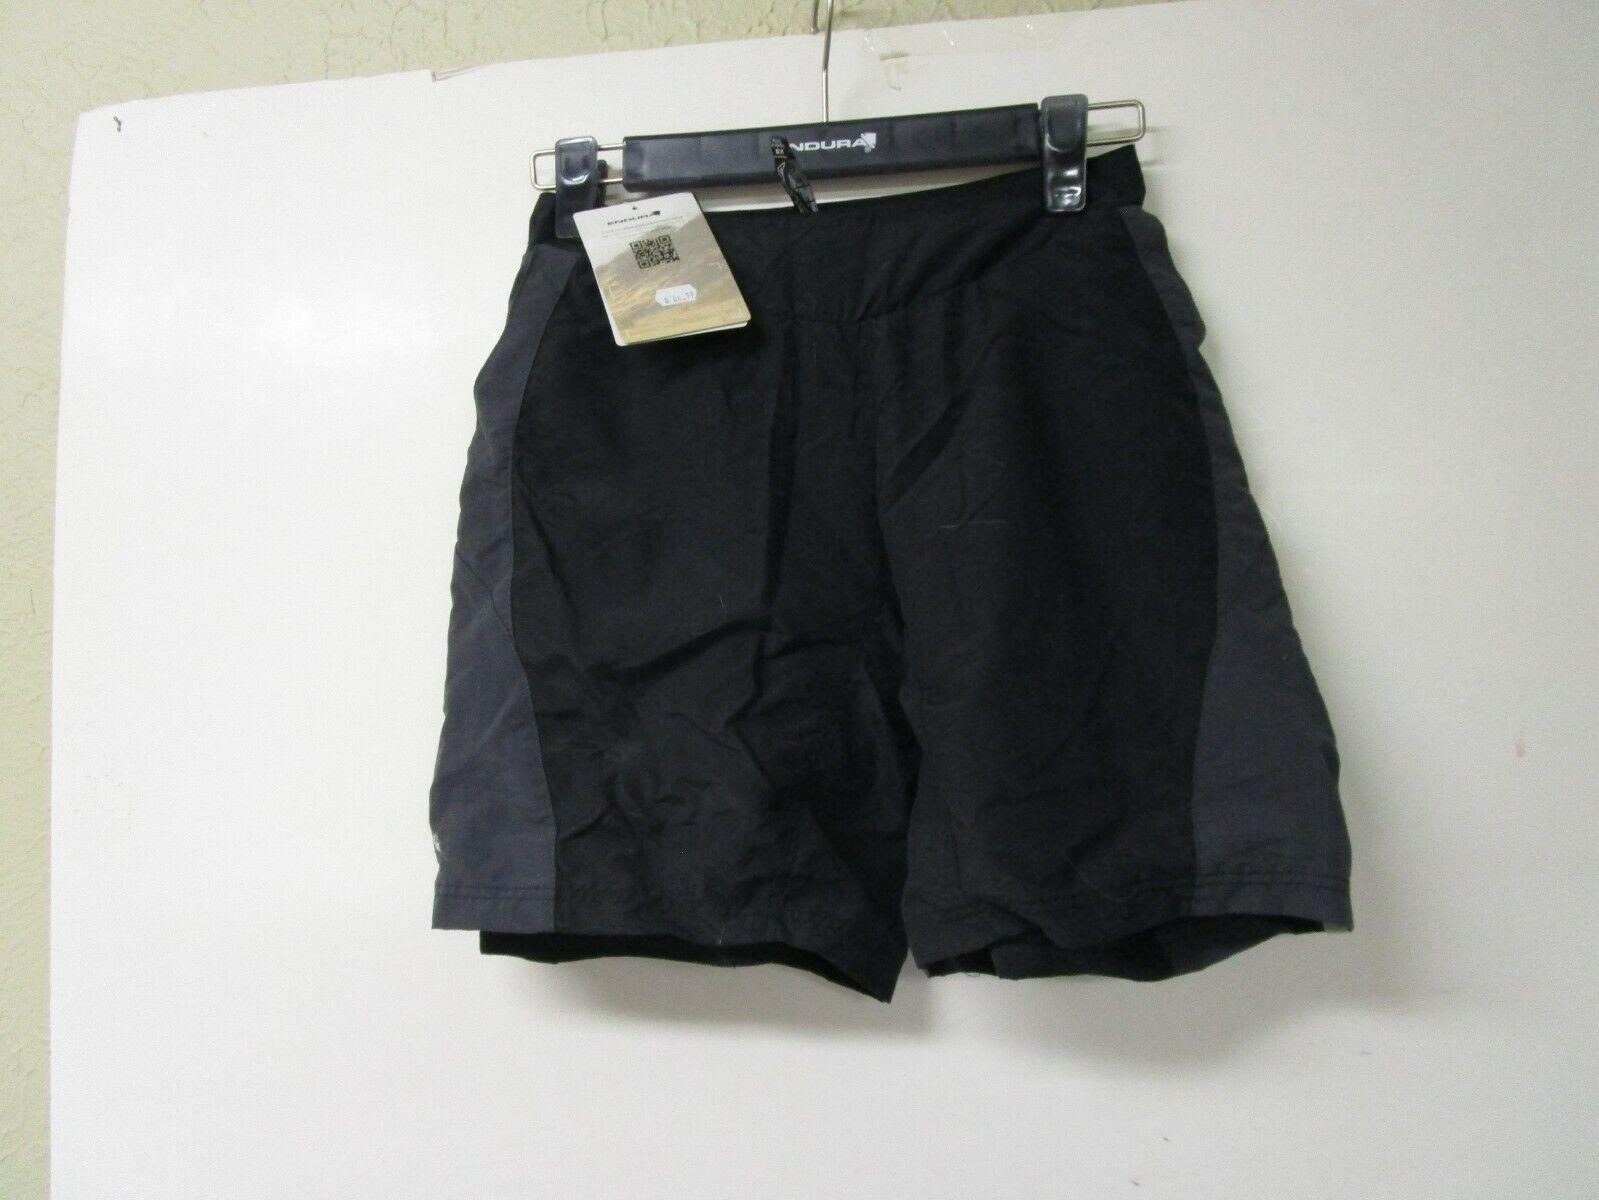 Endura para mujer Pulse XS Extra Pequeño  Bicicleta Ciclismo Shorts Negro -  nuevo con etiquetas   ¡no ser extrañado!